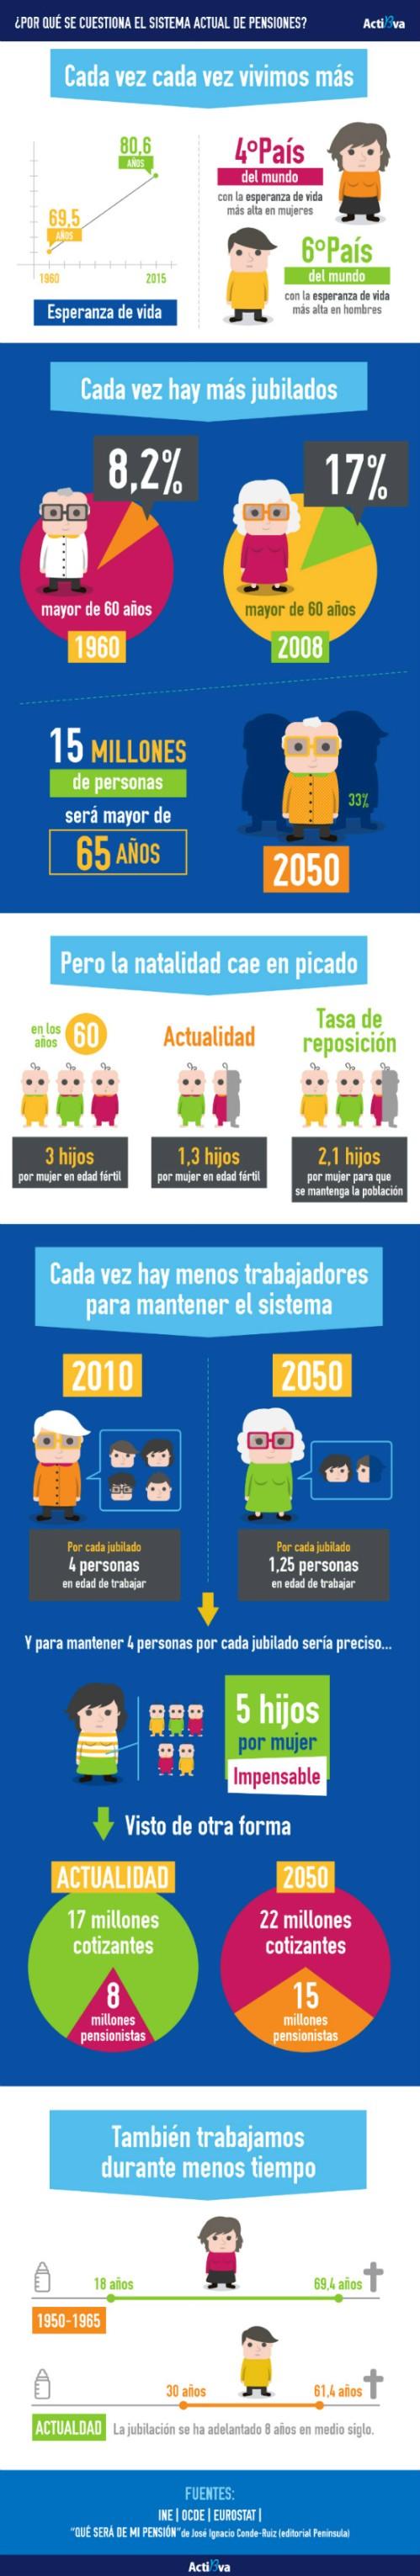 infografia_pensiones.jpg